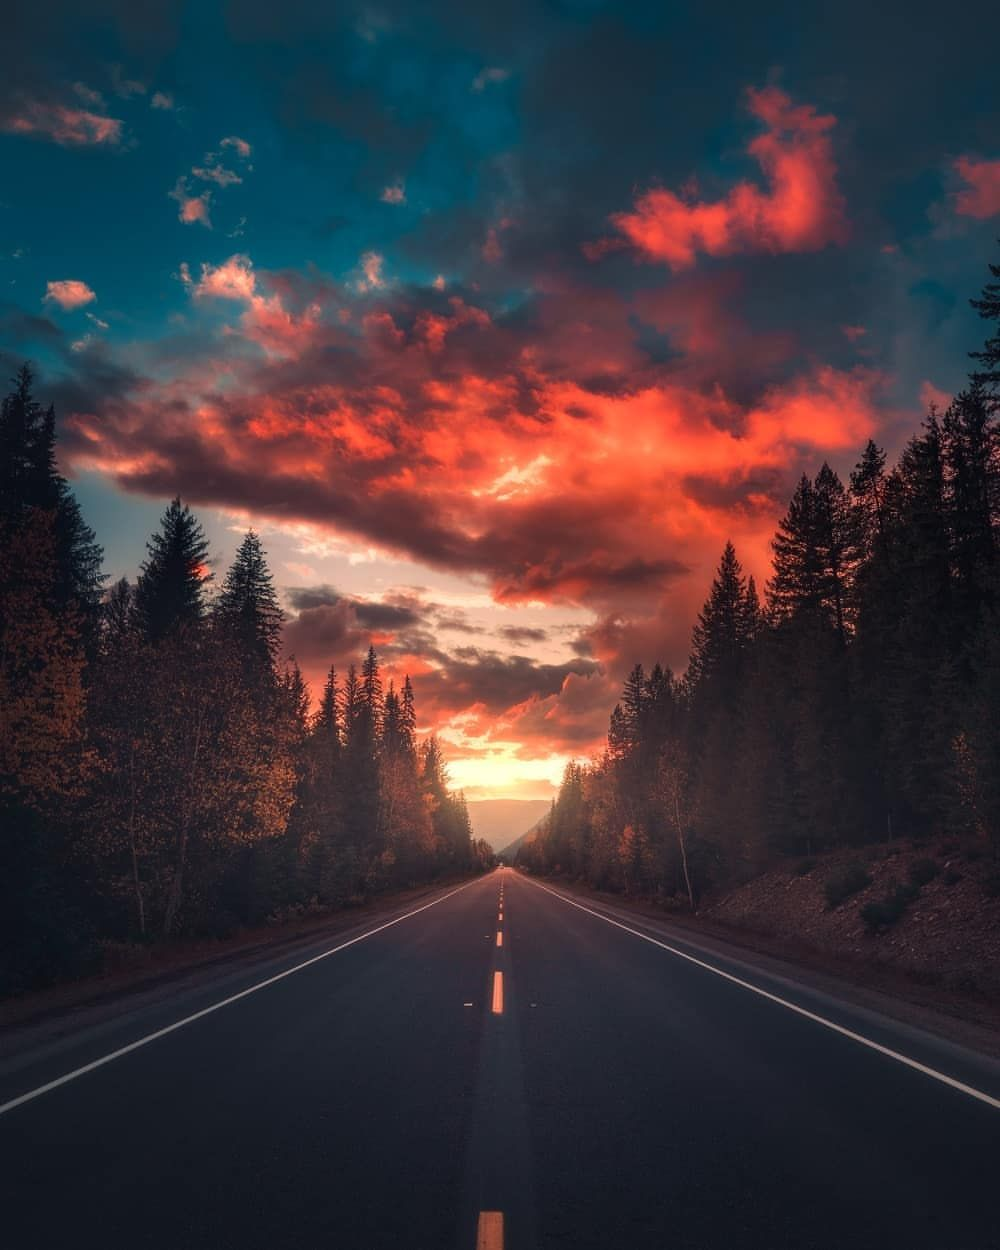 Dreamlike and Moody Landscape